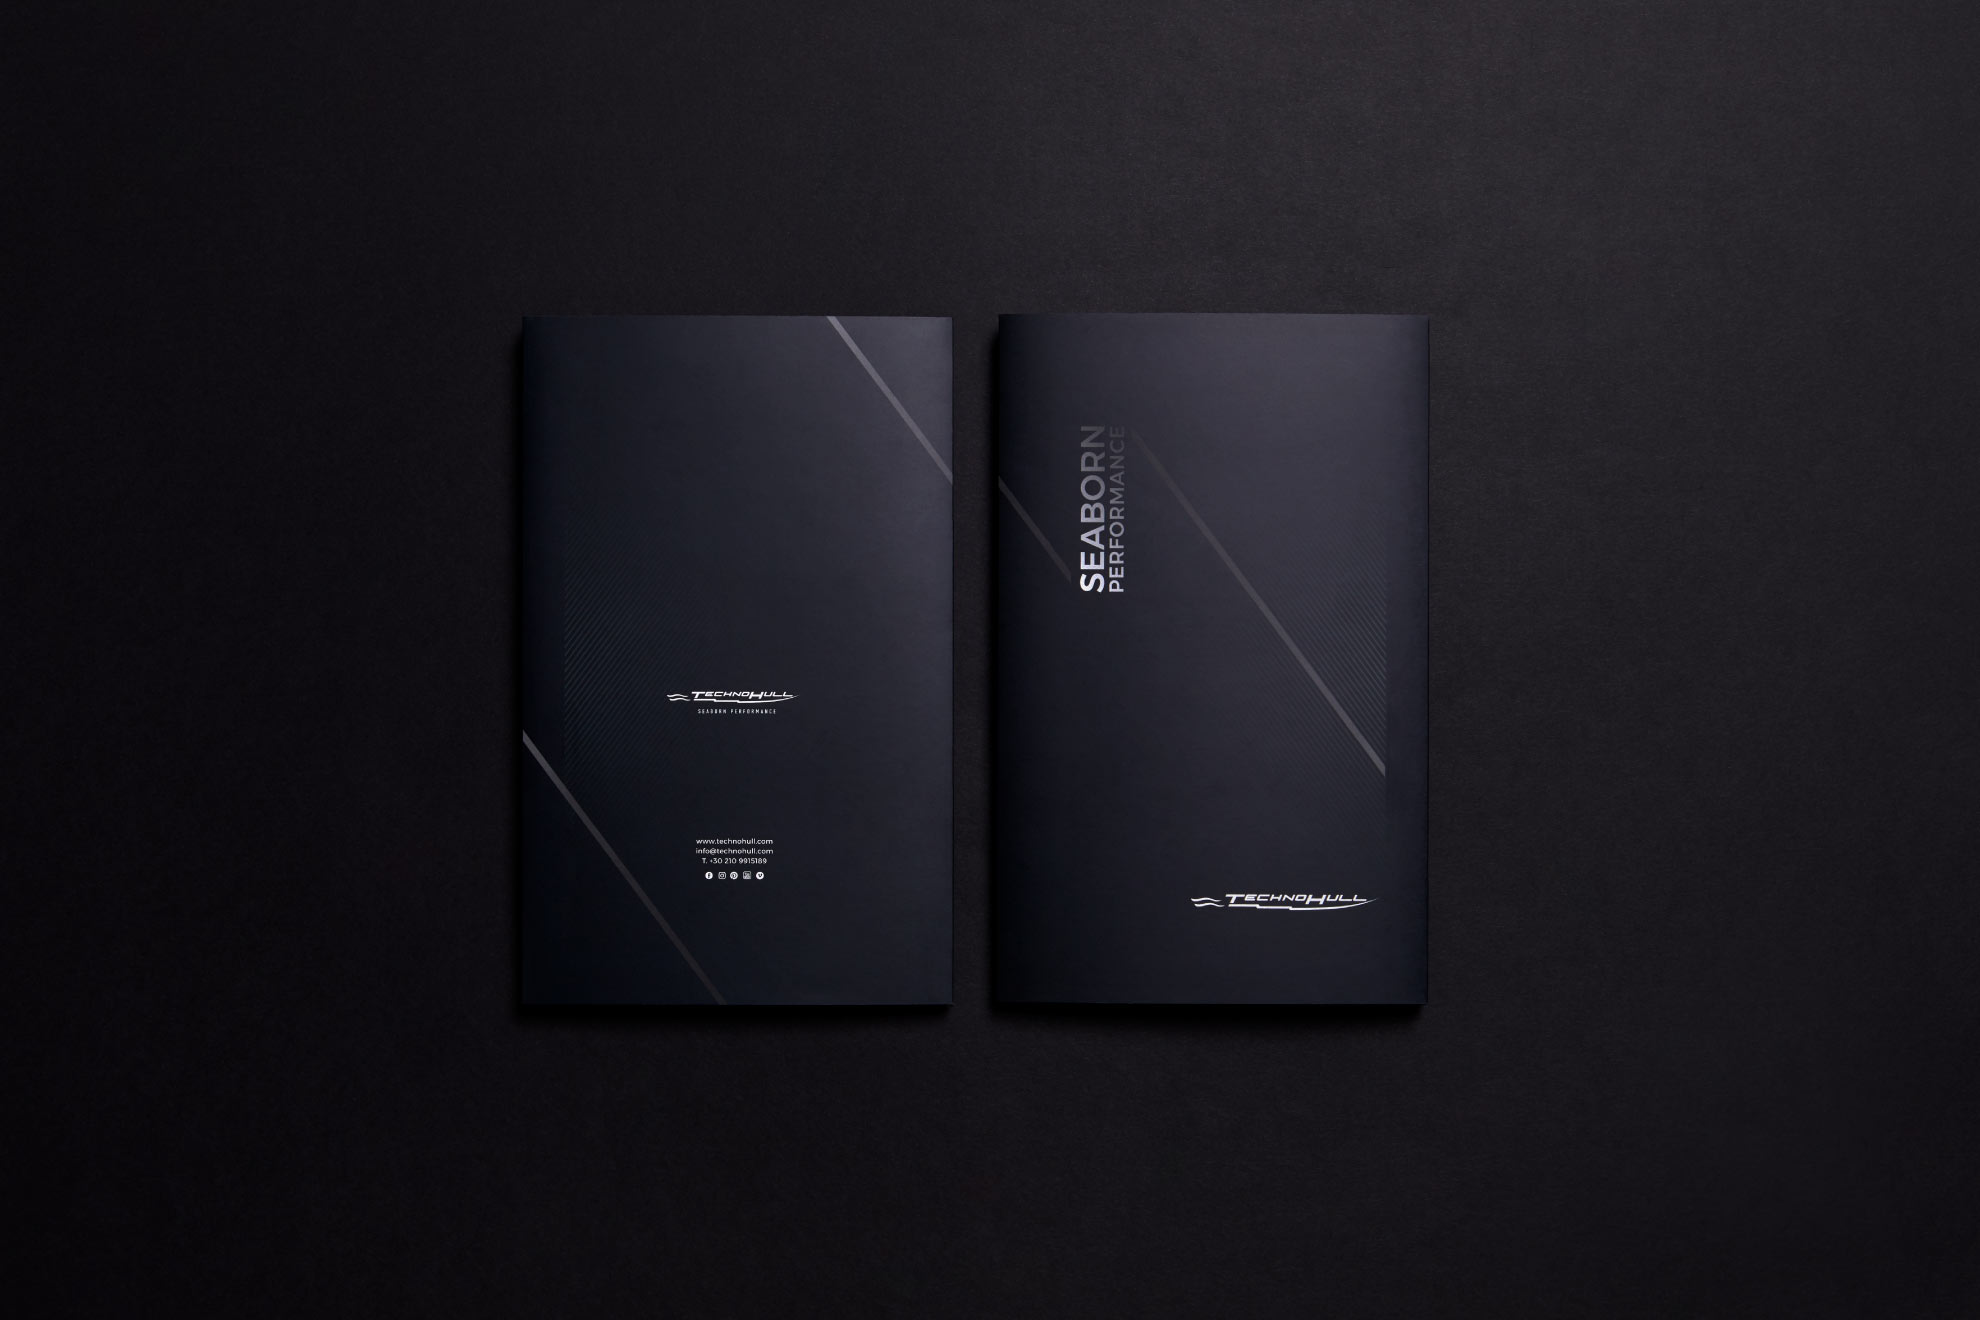 mdesigners-case-techohull-image4